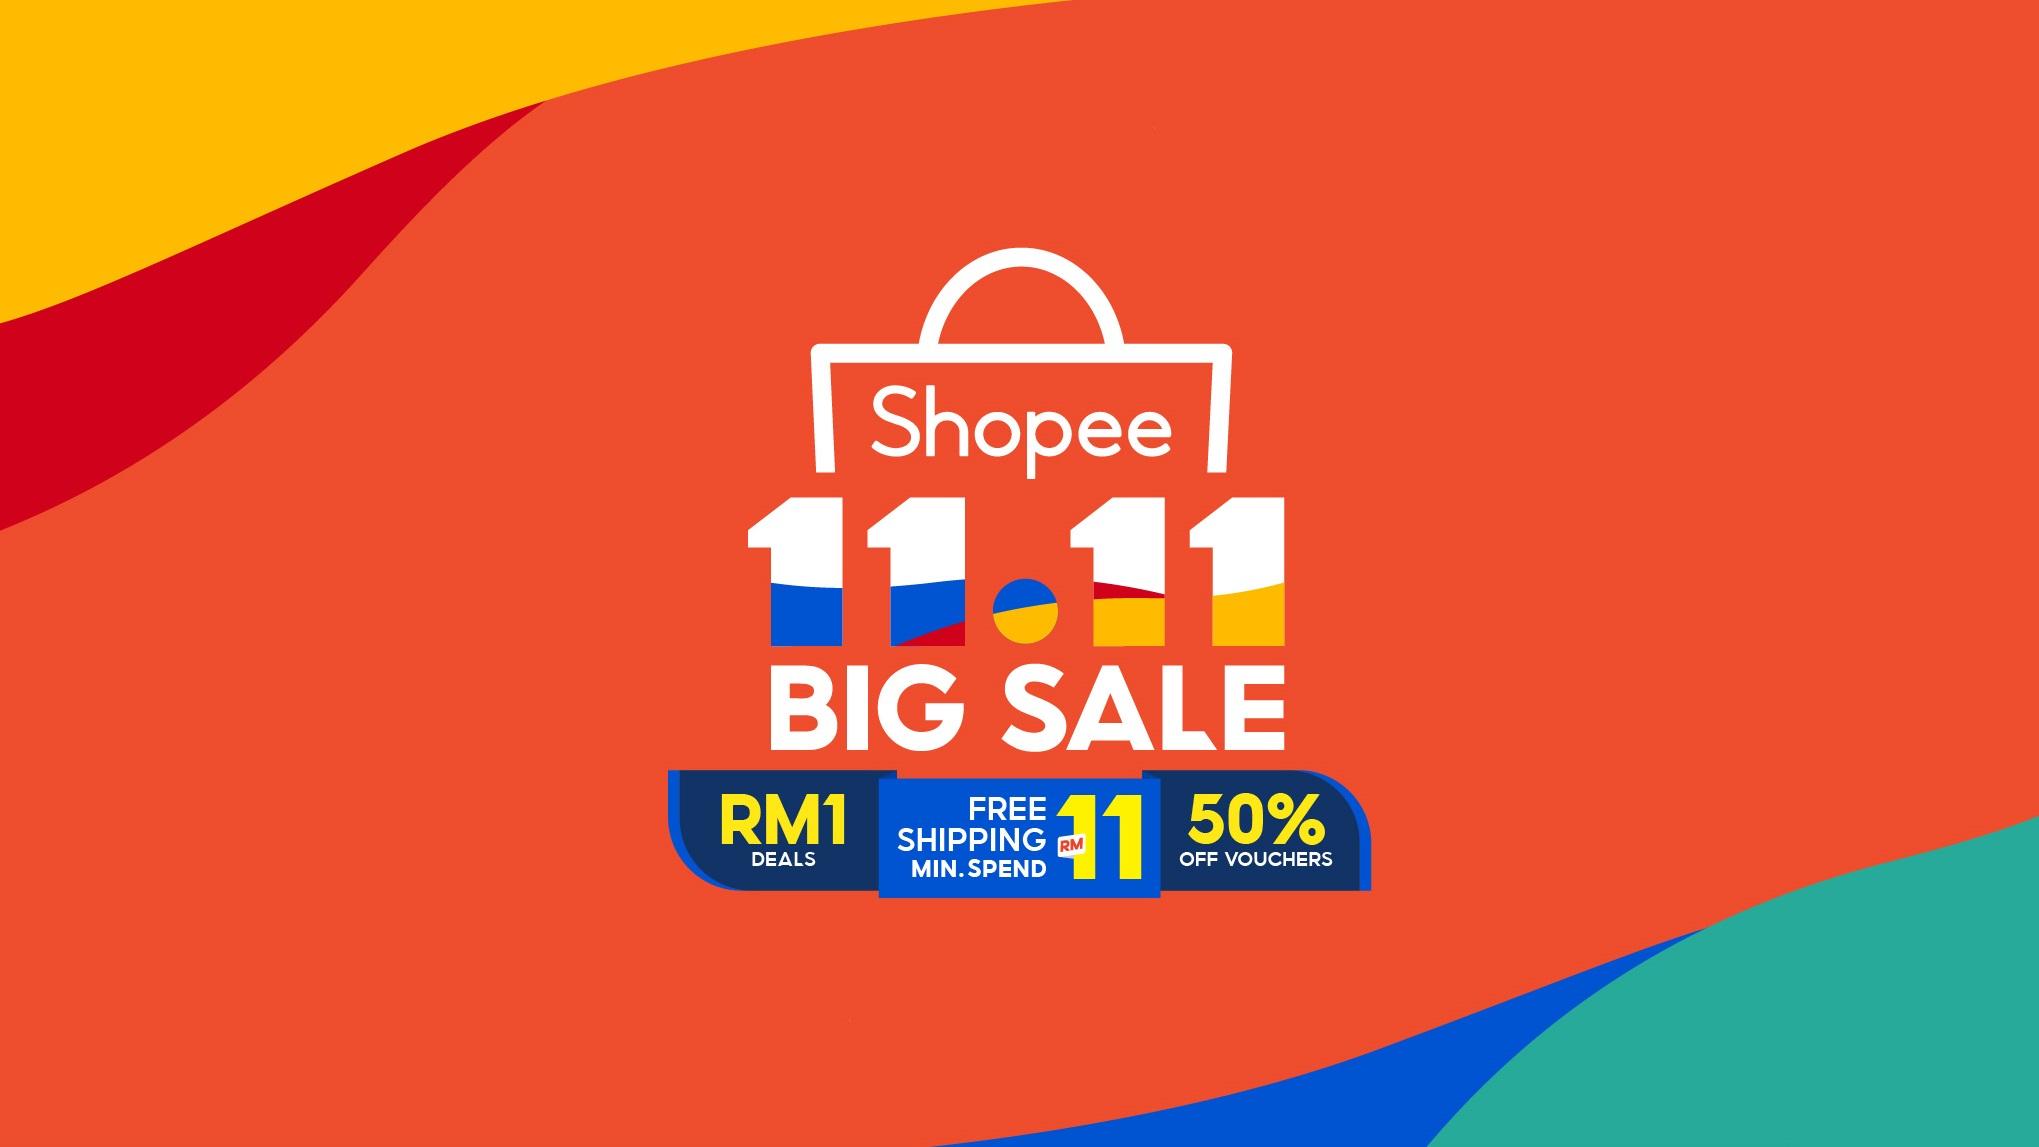 2020 Shopee 11.11 Big Sale